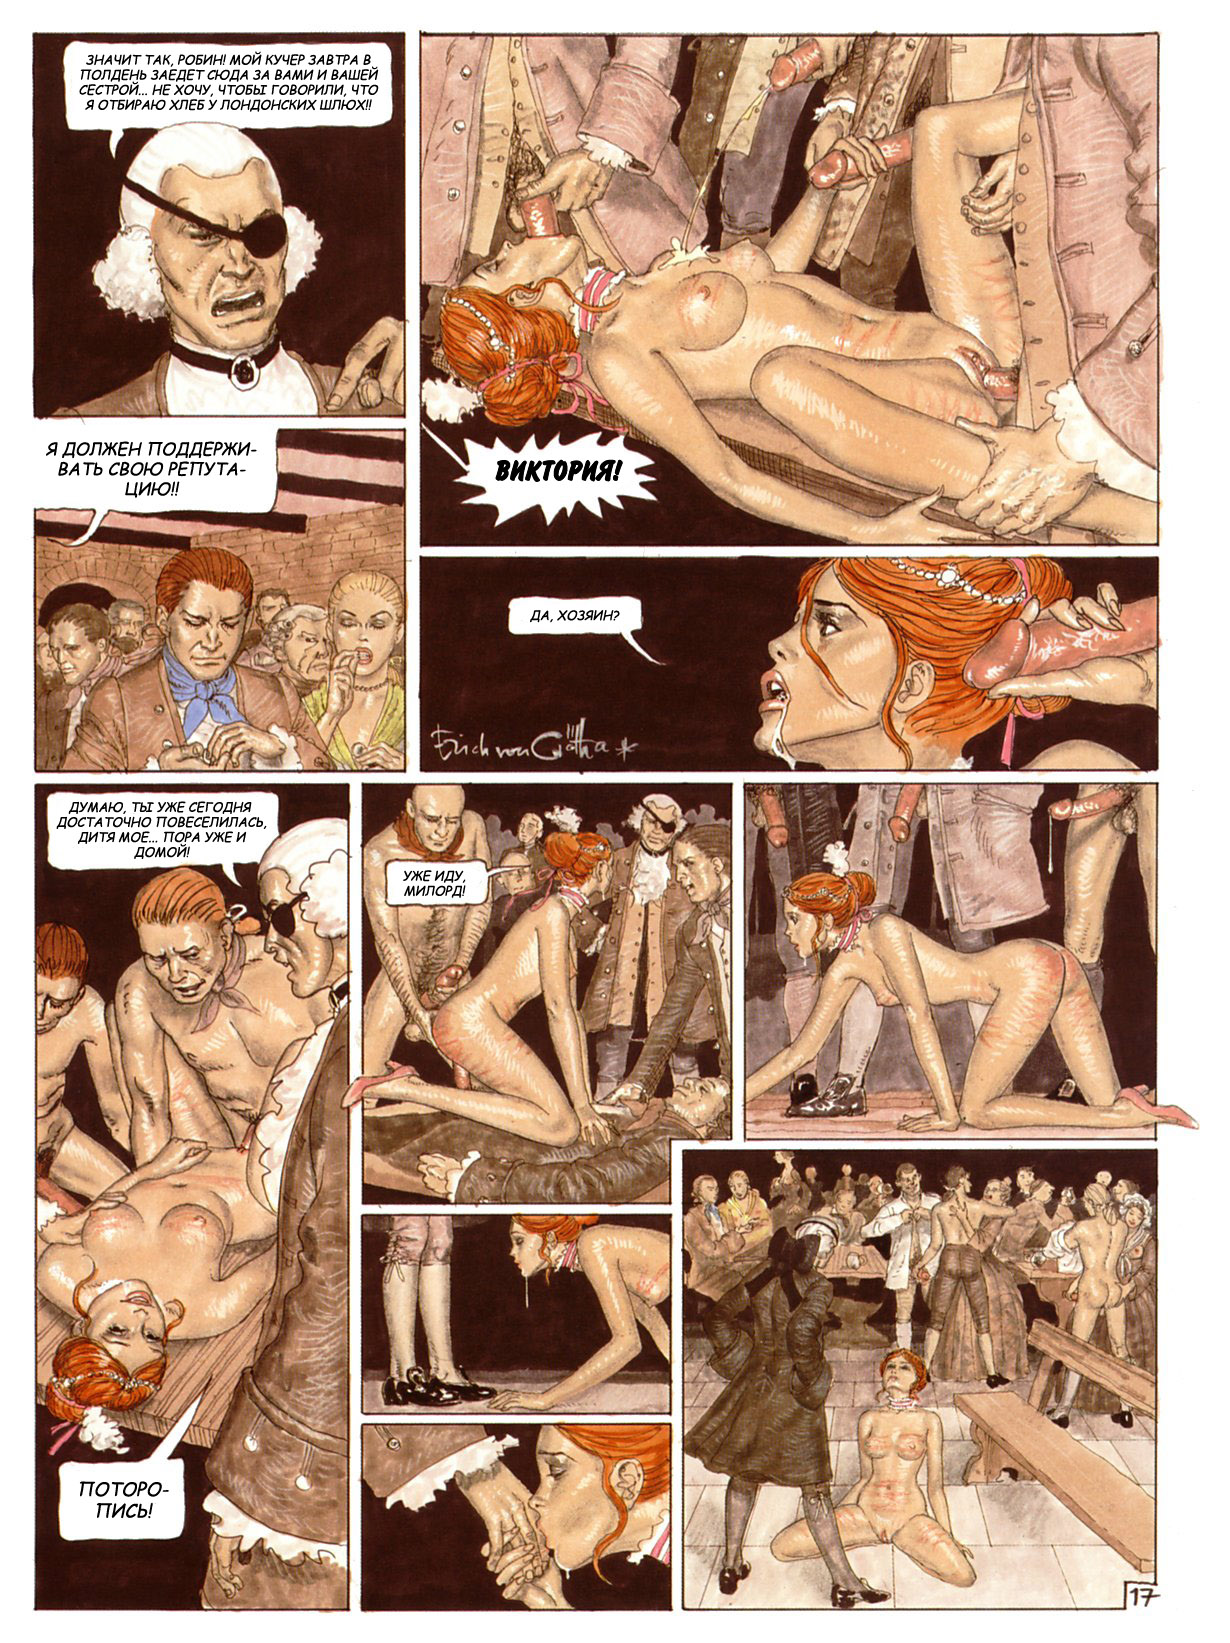 Читать Онлайн Комиксы Эротика